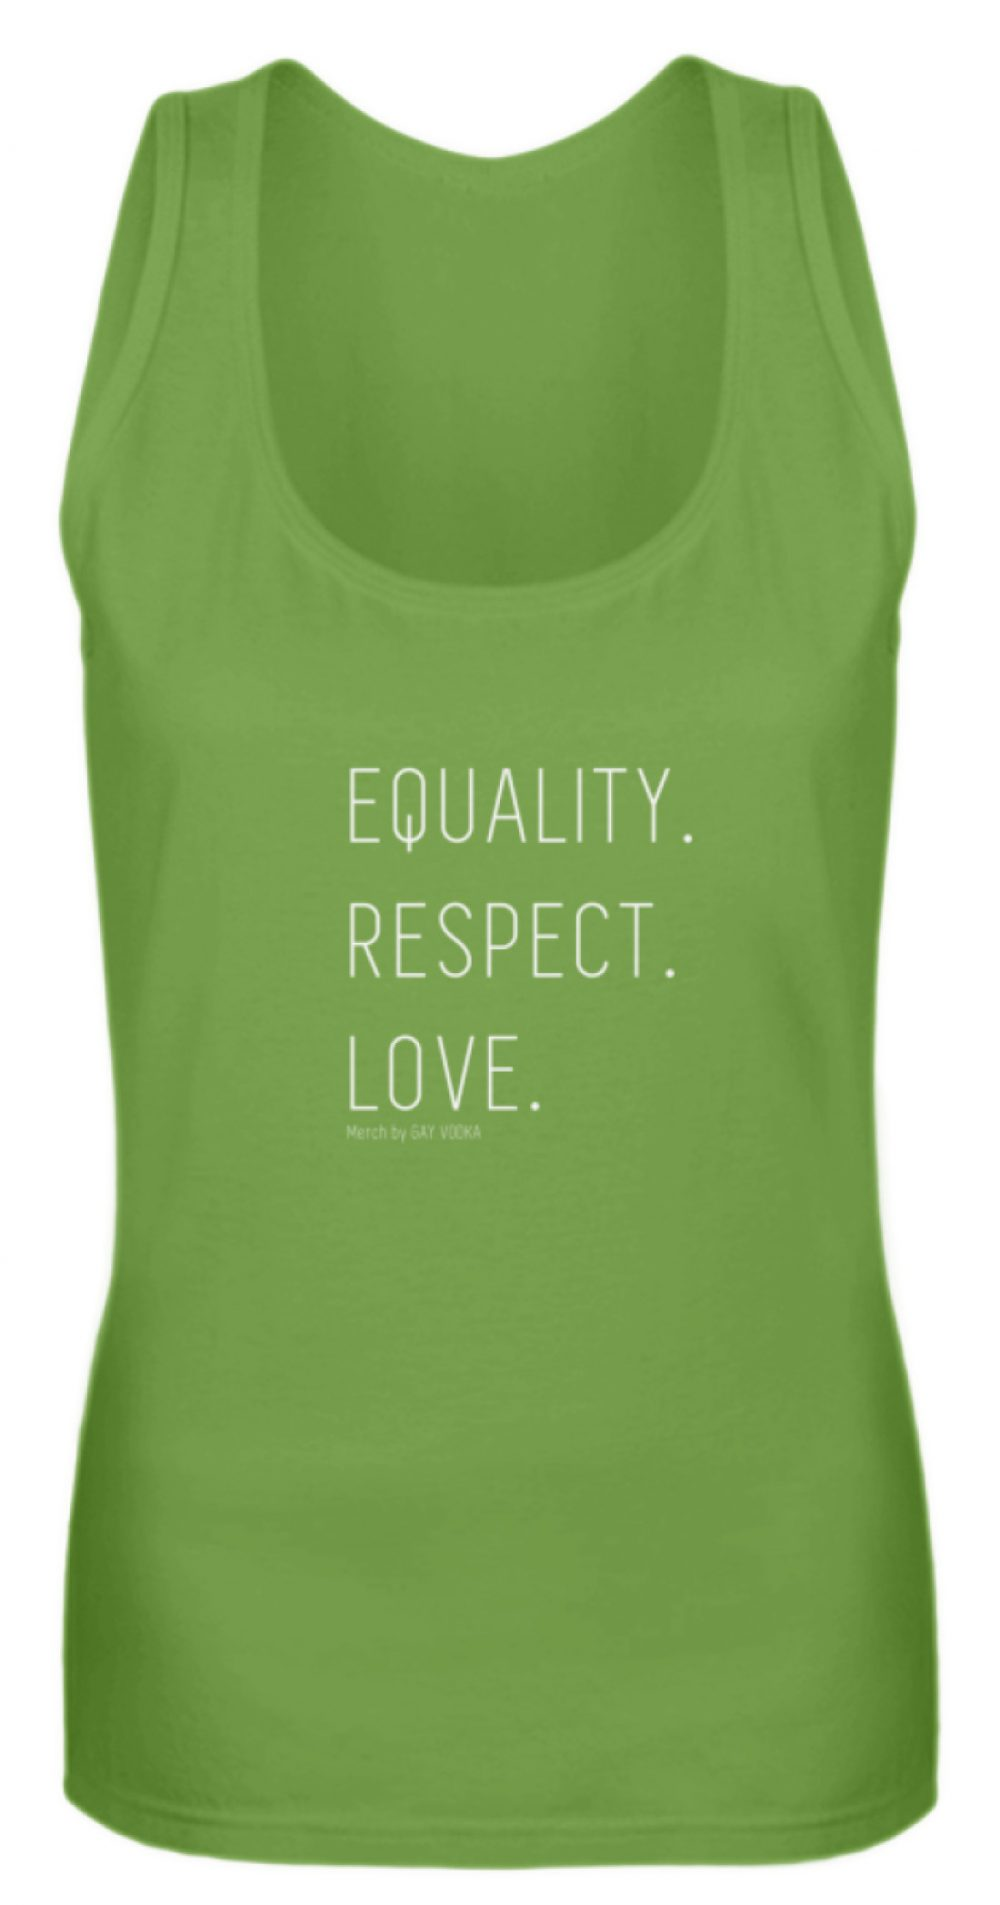 EQUALITY. RESPECT. LOVE. - Frauen Tanktop-1646